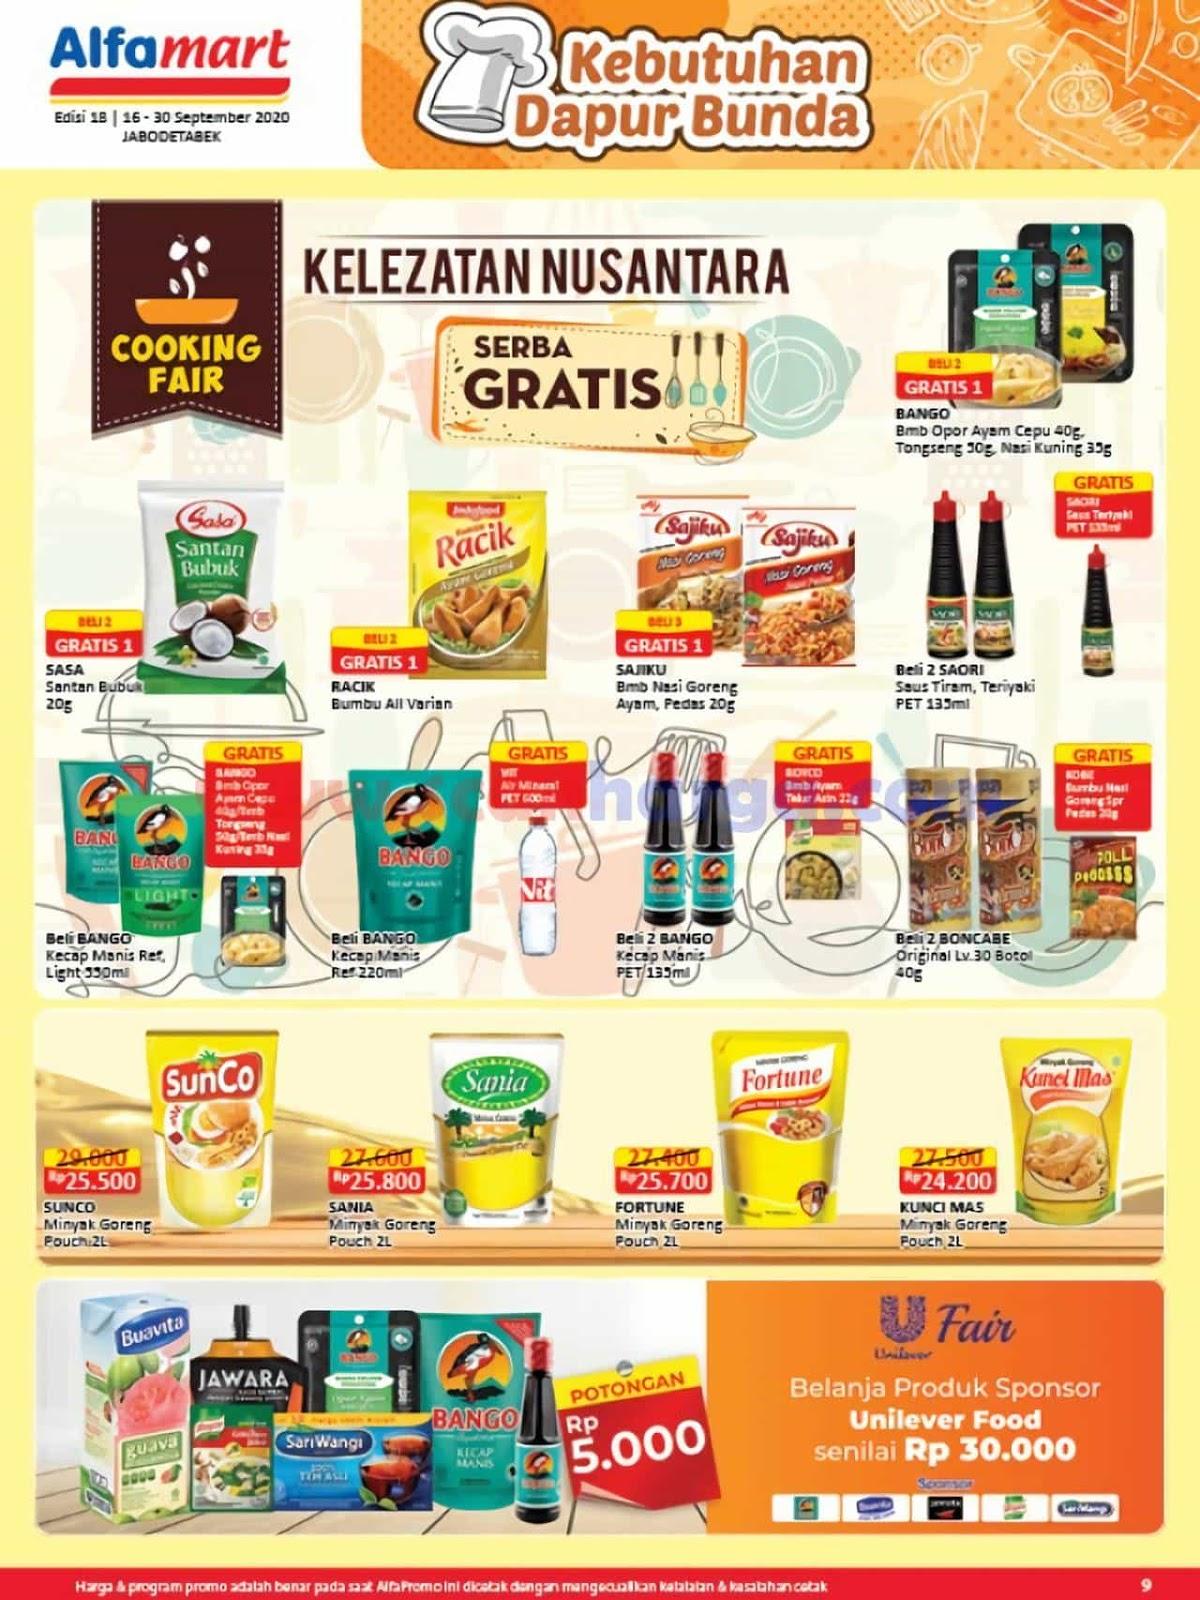 Katalog Promo Alfamart 16 - 30 September 2020 9